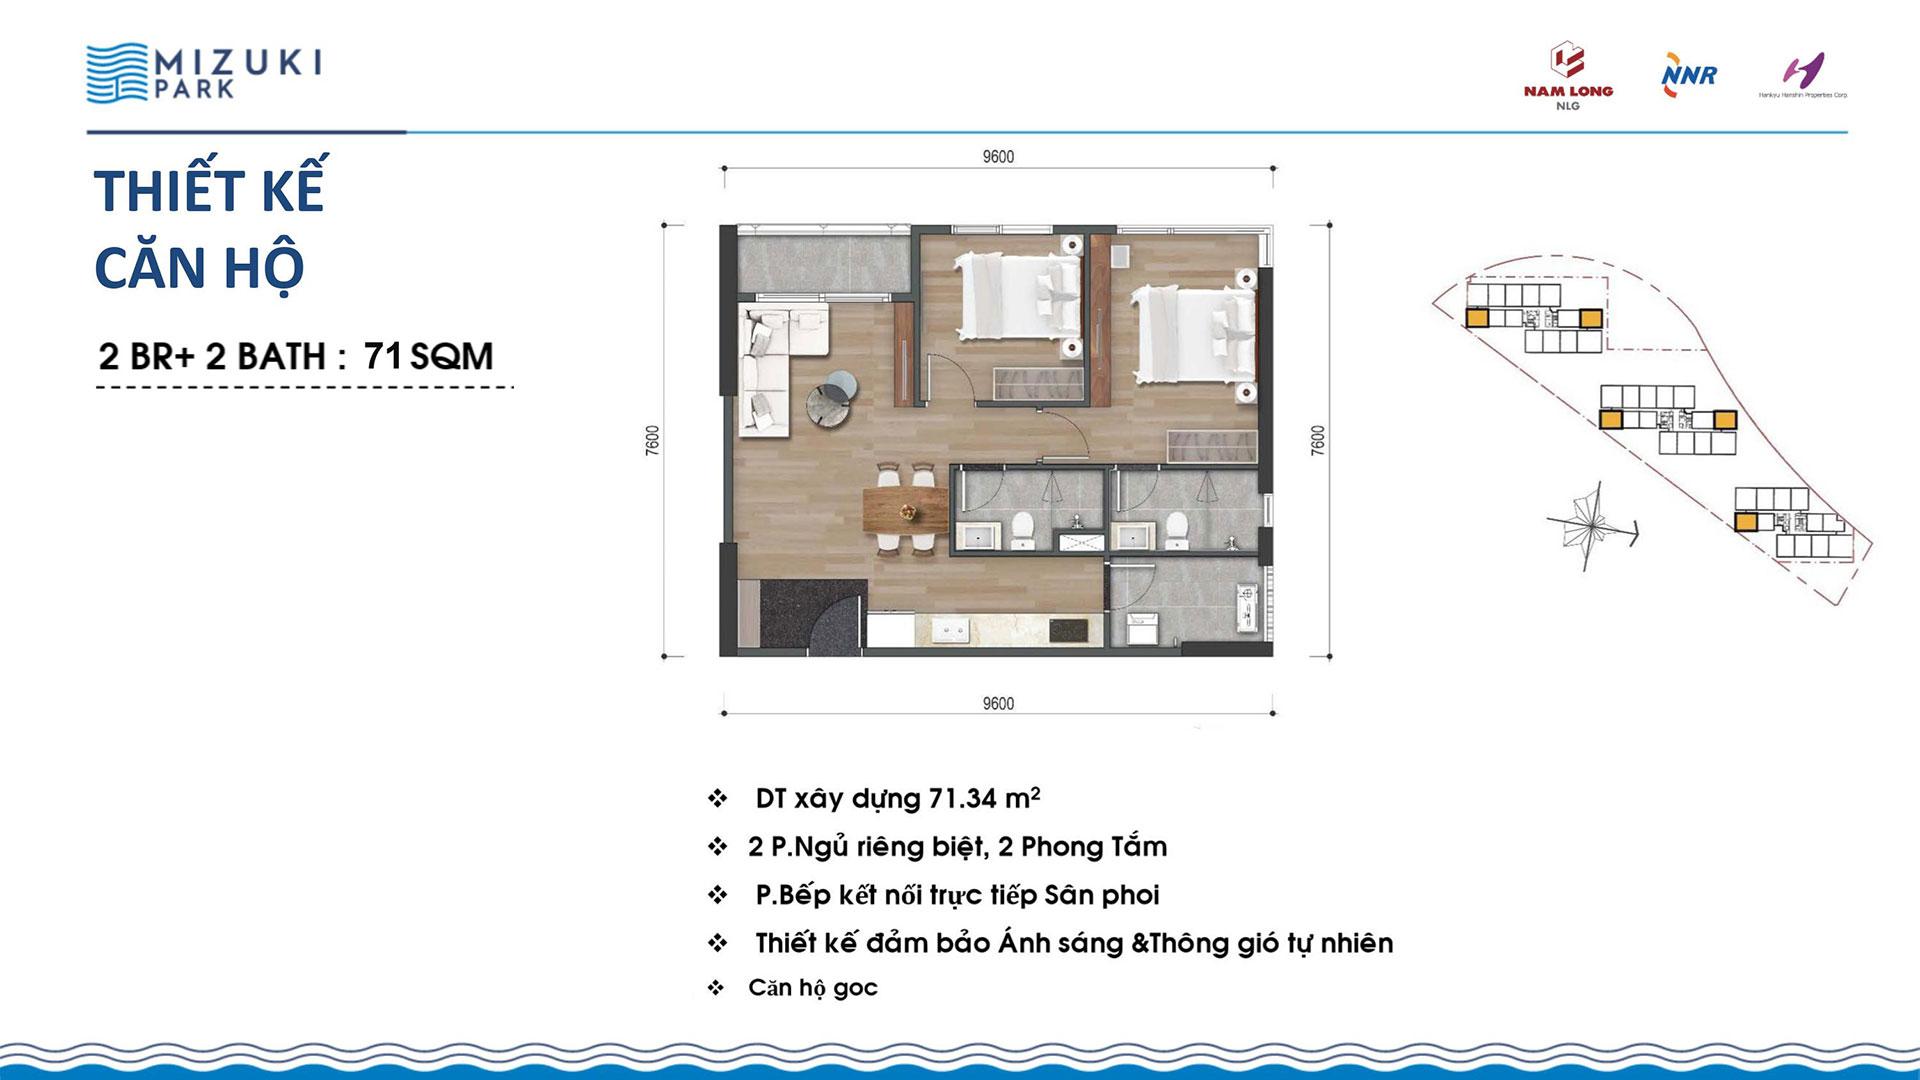 Thiết kế căn hộ Mizuki Park 71m2